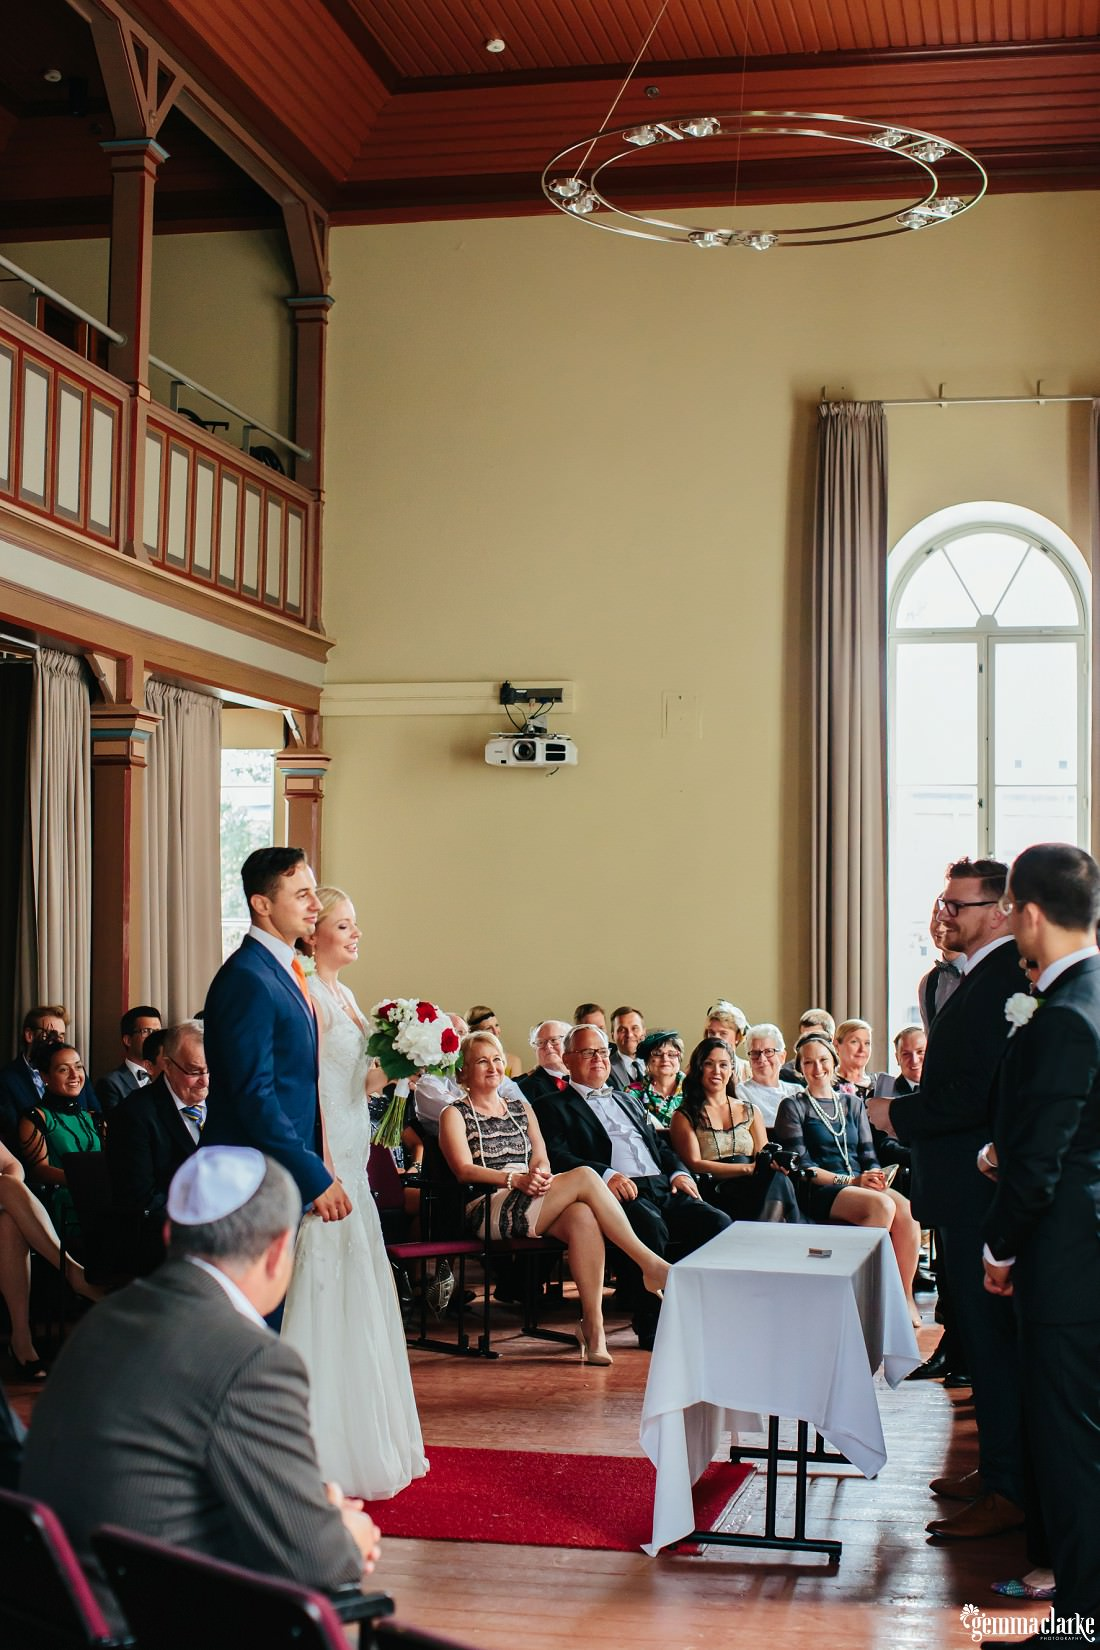 A wedding ceremony in progress